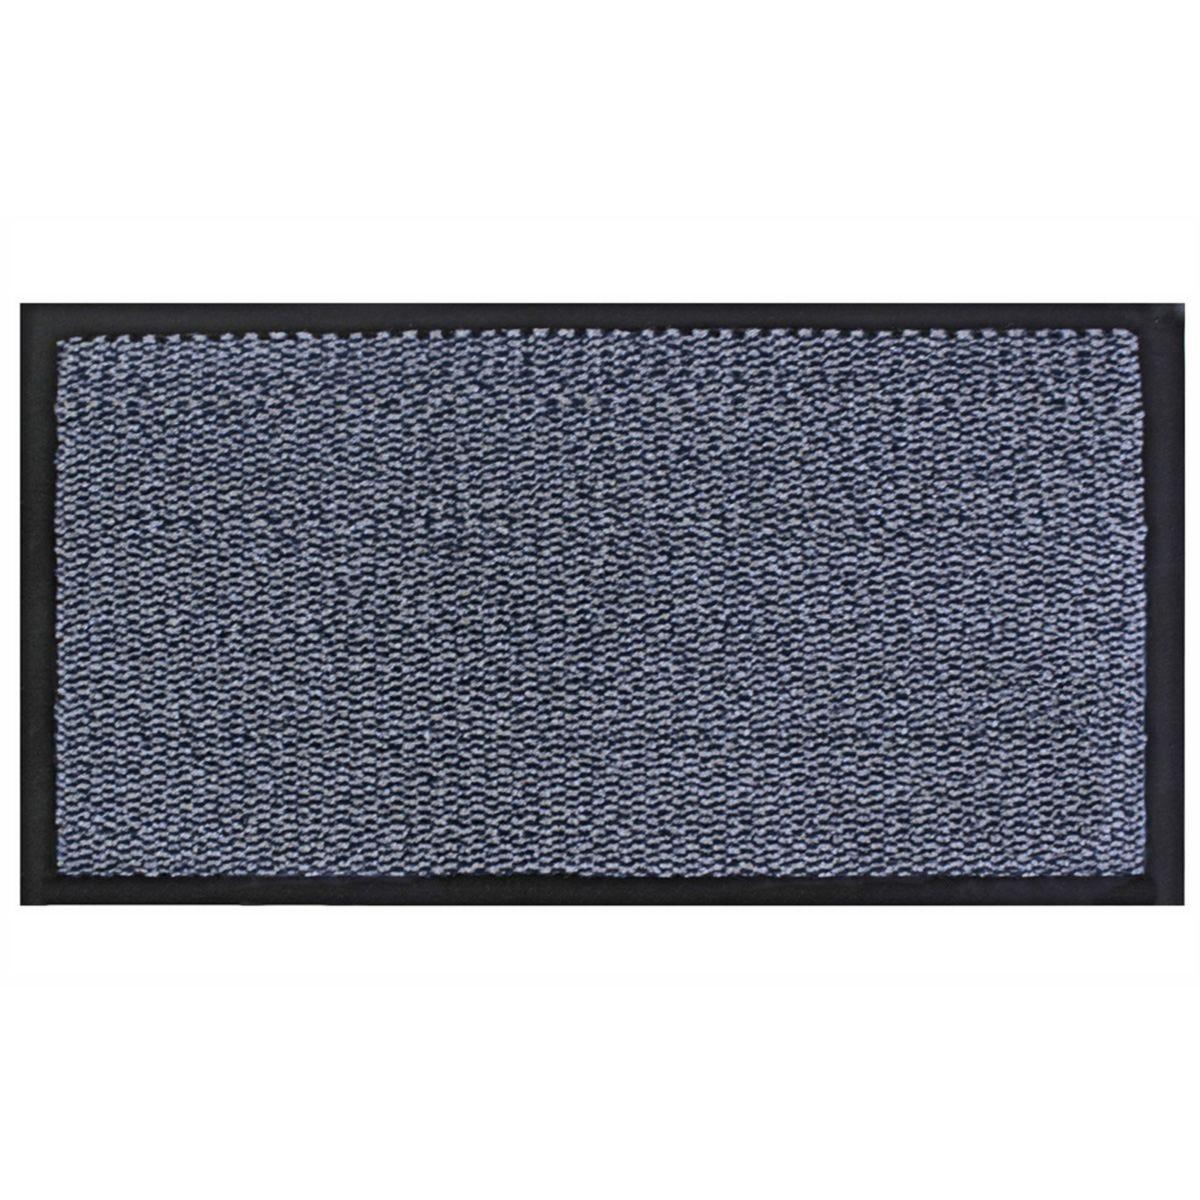 JVL Heavy Duty Commodore Backed Barrier Door Floor Mat Blue/Black 60 x 150 cm